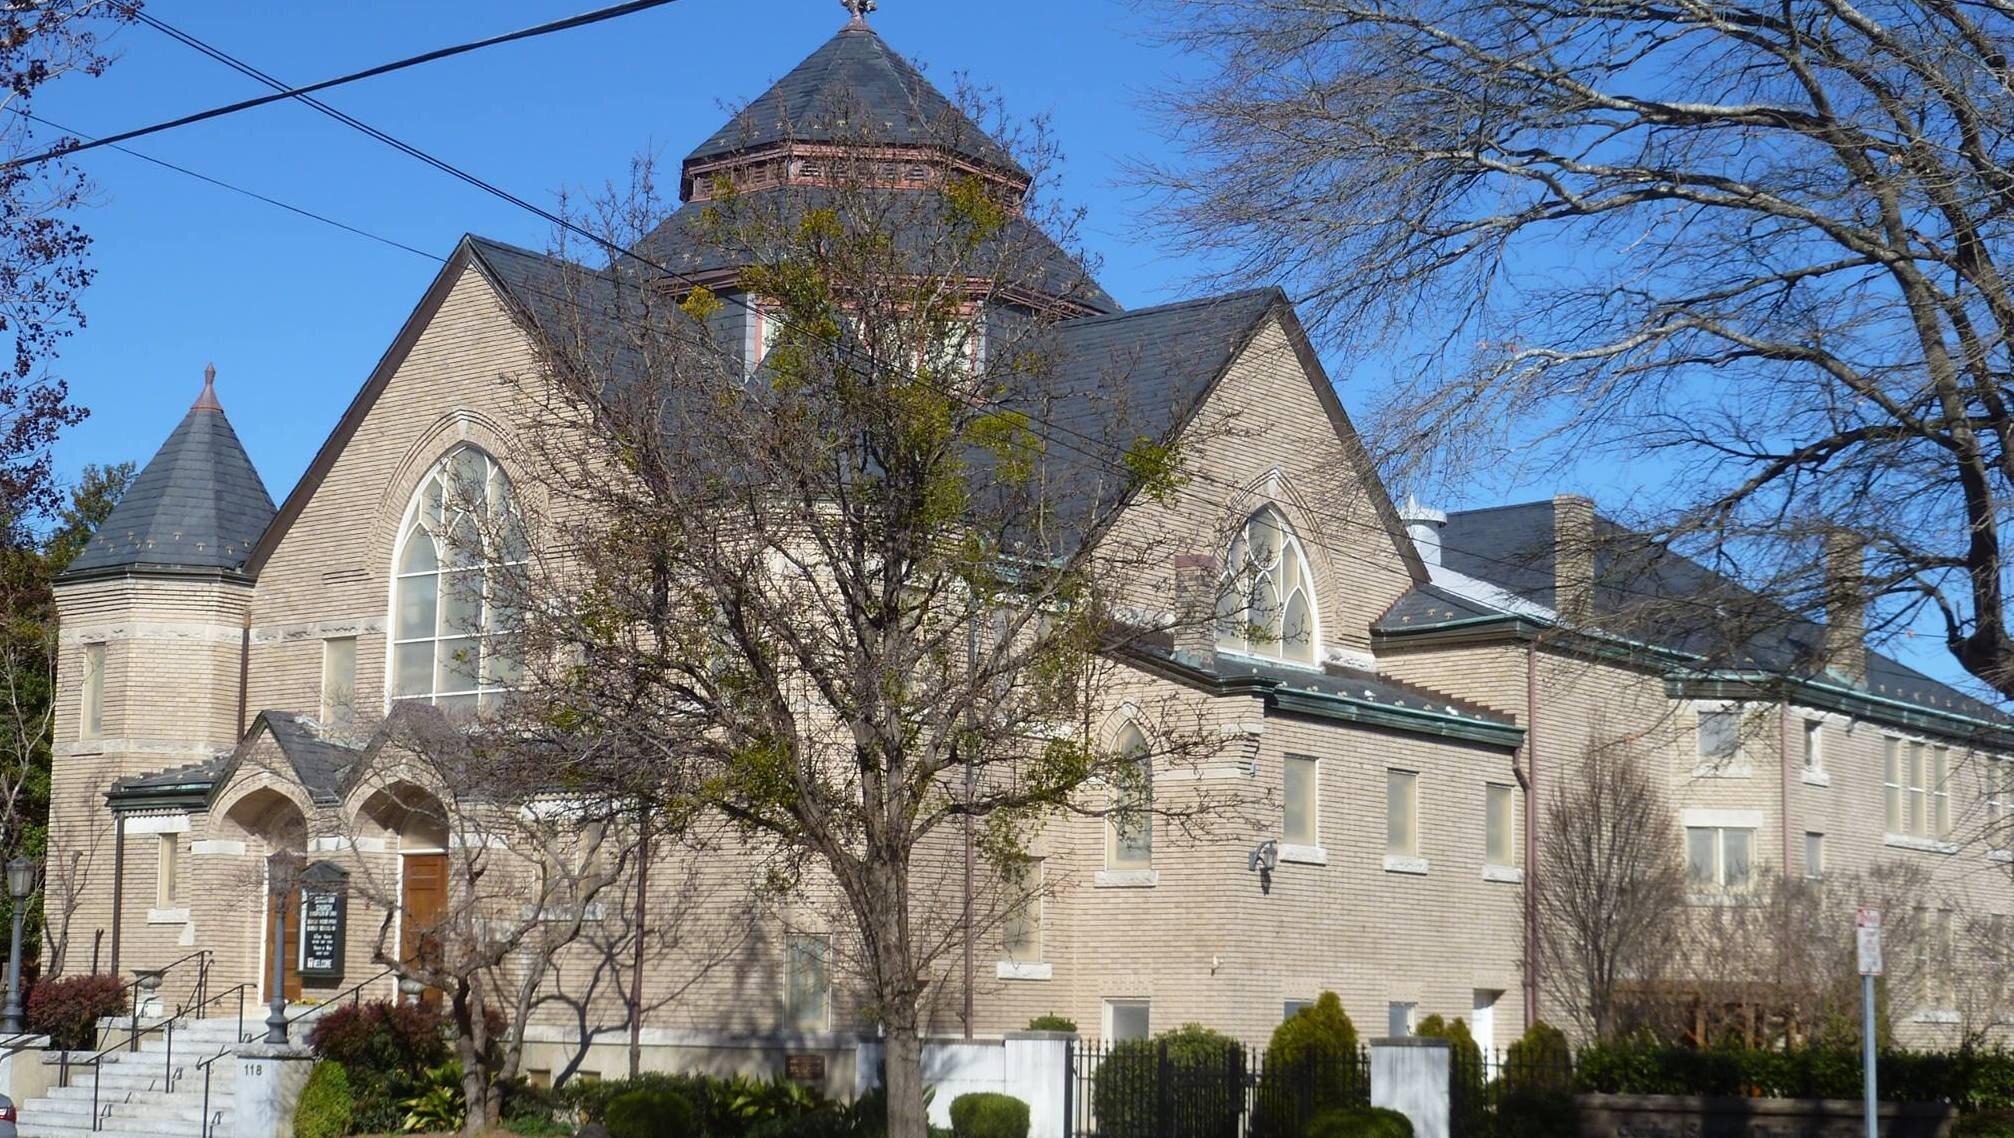 GORDON ST CHRISTIAN CHURCH - 118 E. Gordon St • Kinston, NC 28501(252) 523-4143